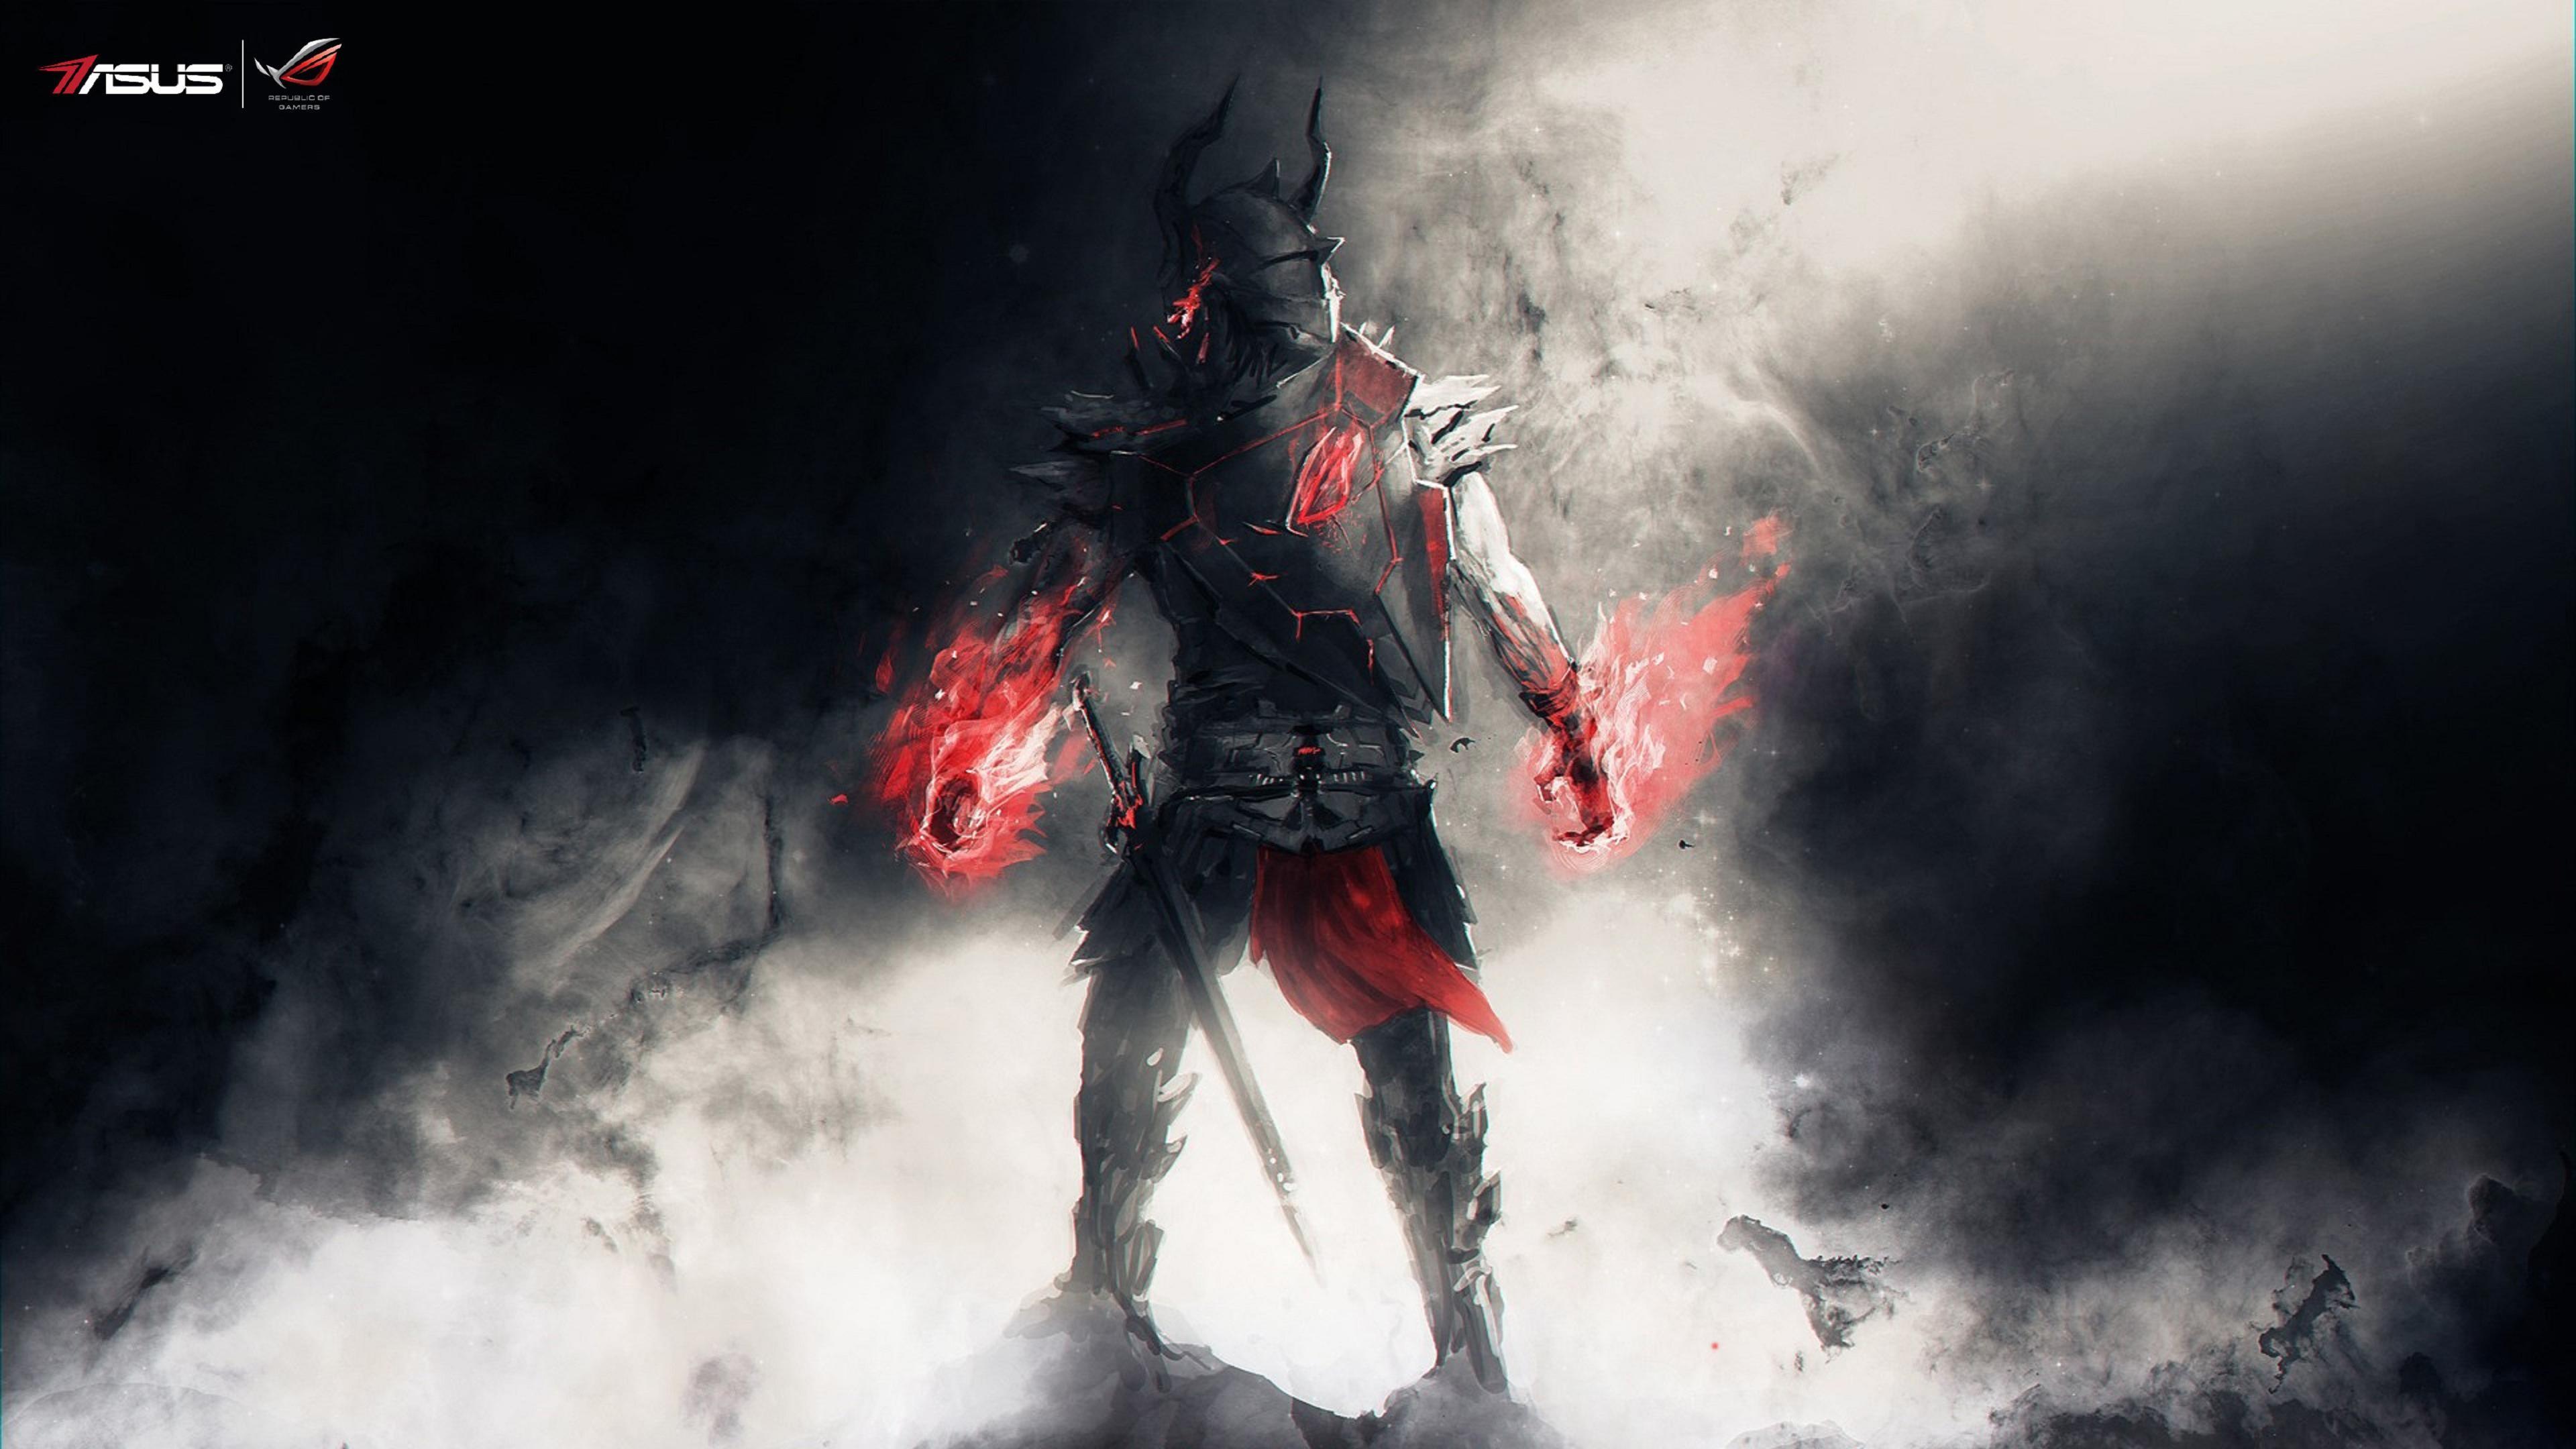 … jm 35 gaming wallpaper hd cool gaming hd hd wallpapers ie w …